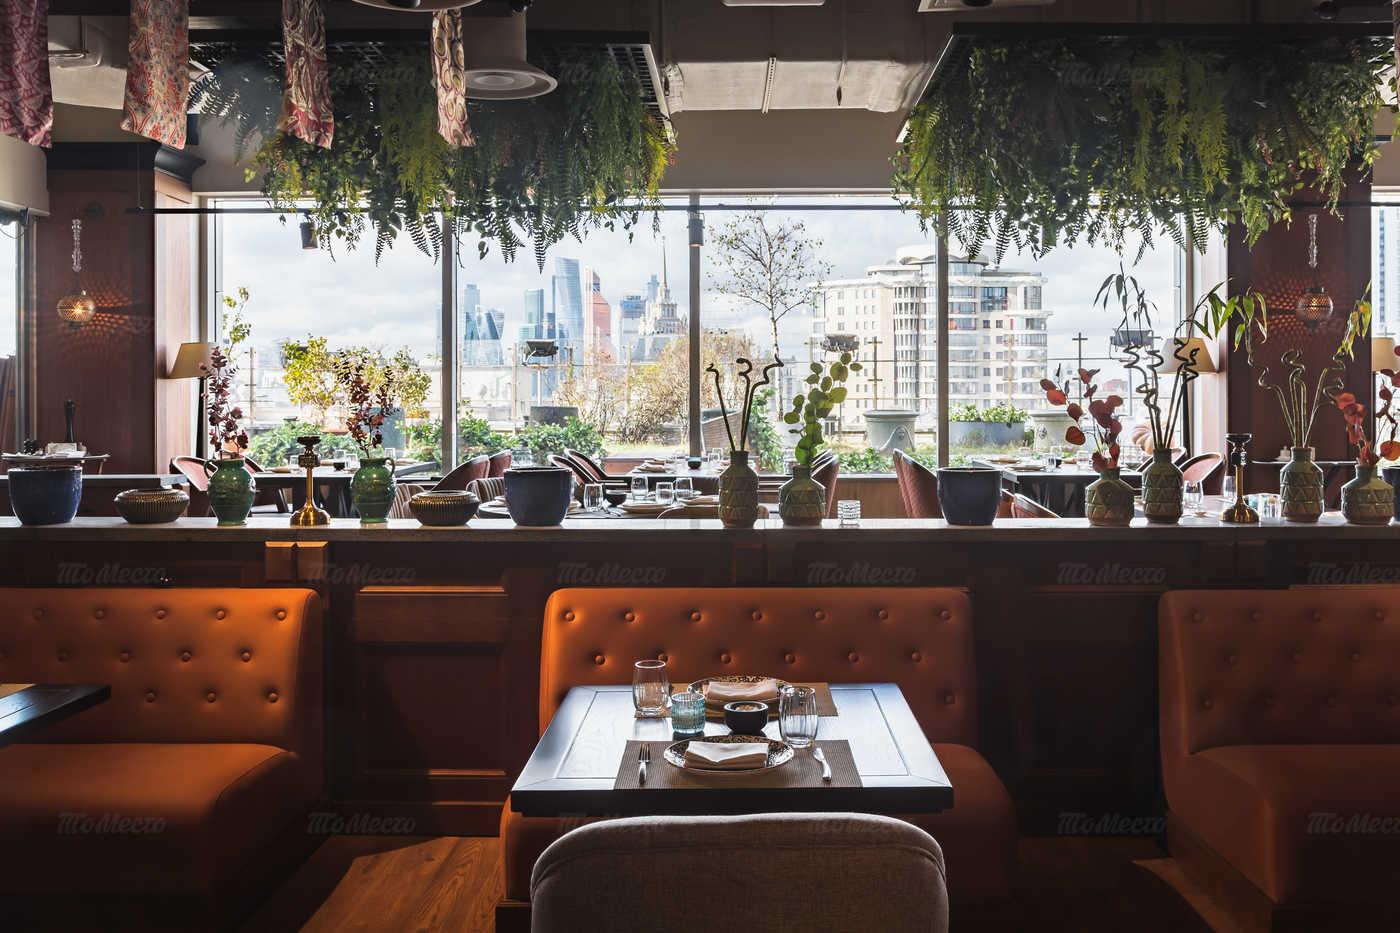 Ресторан Левантин (Levantine) на Новинском бульваре фото 4